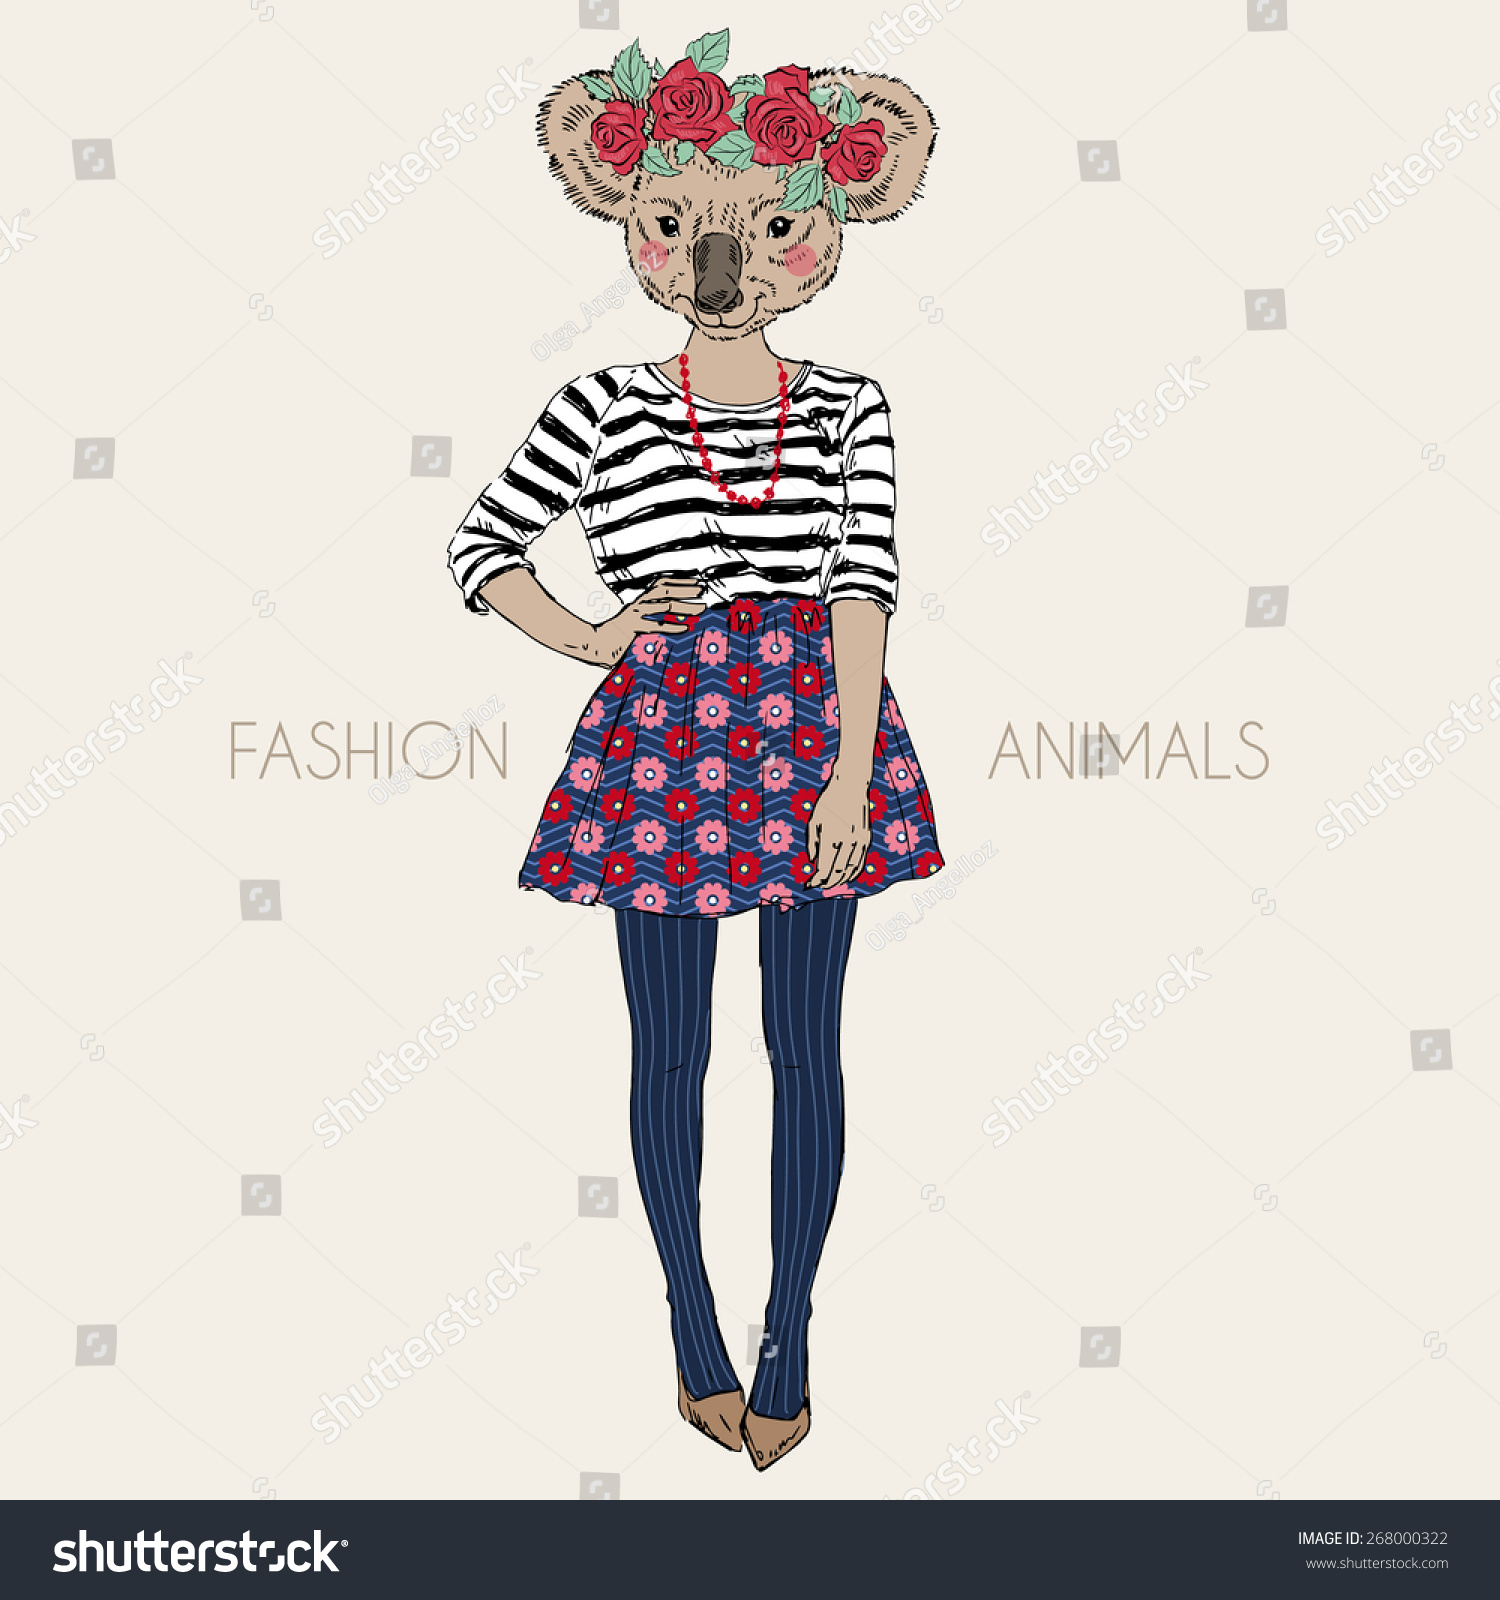 Cute Character Design Illustrator : Fashion animal illustration cute koala hipster stock